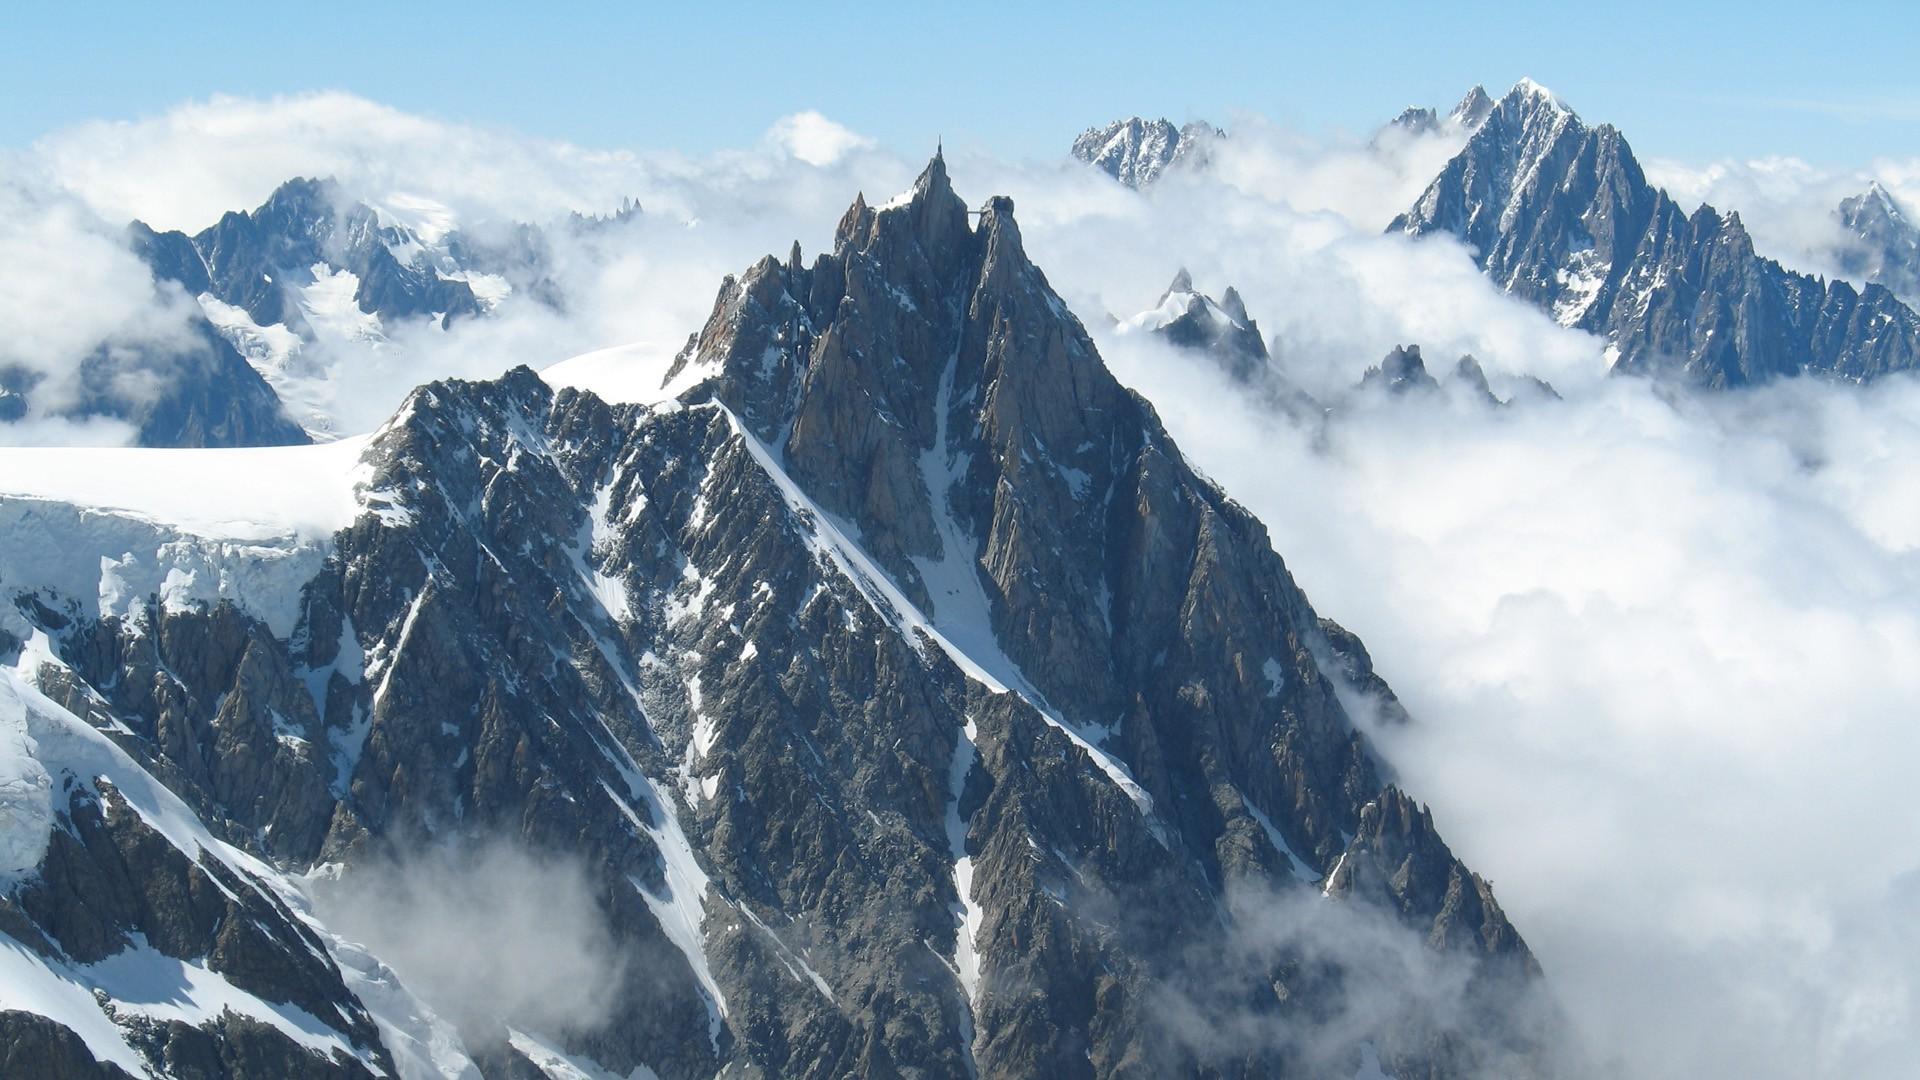 Fondo Escritorio Paisaje Nevada En Cumbre: Fondos De Pantalla : Paisaje, Naturaleza, Nieve, Invierno